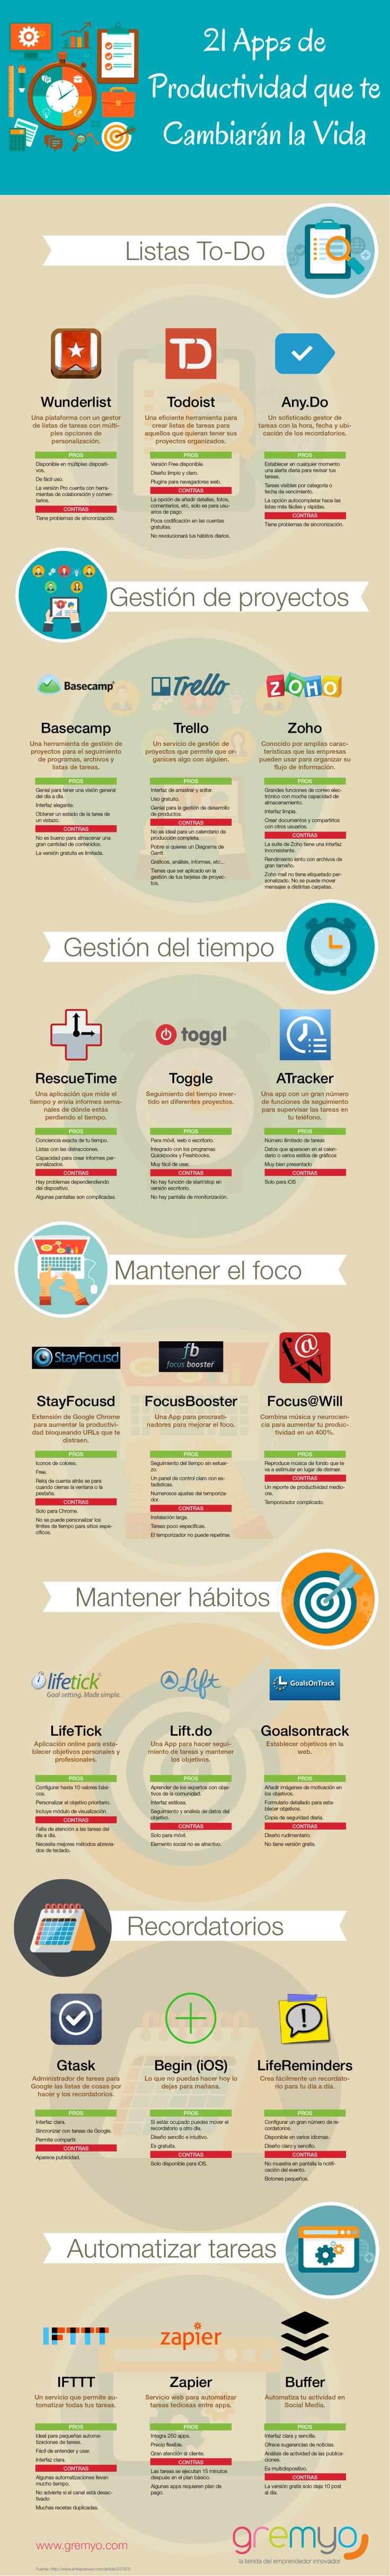 21 Apps de Productividad que te cambiarán la vida #infografia #infographic #productividad